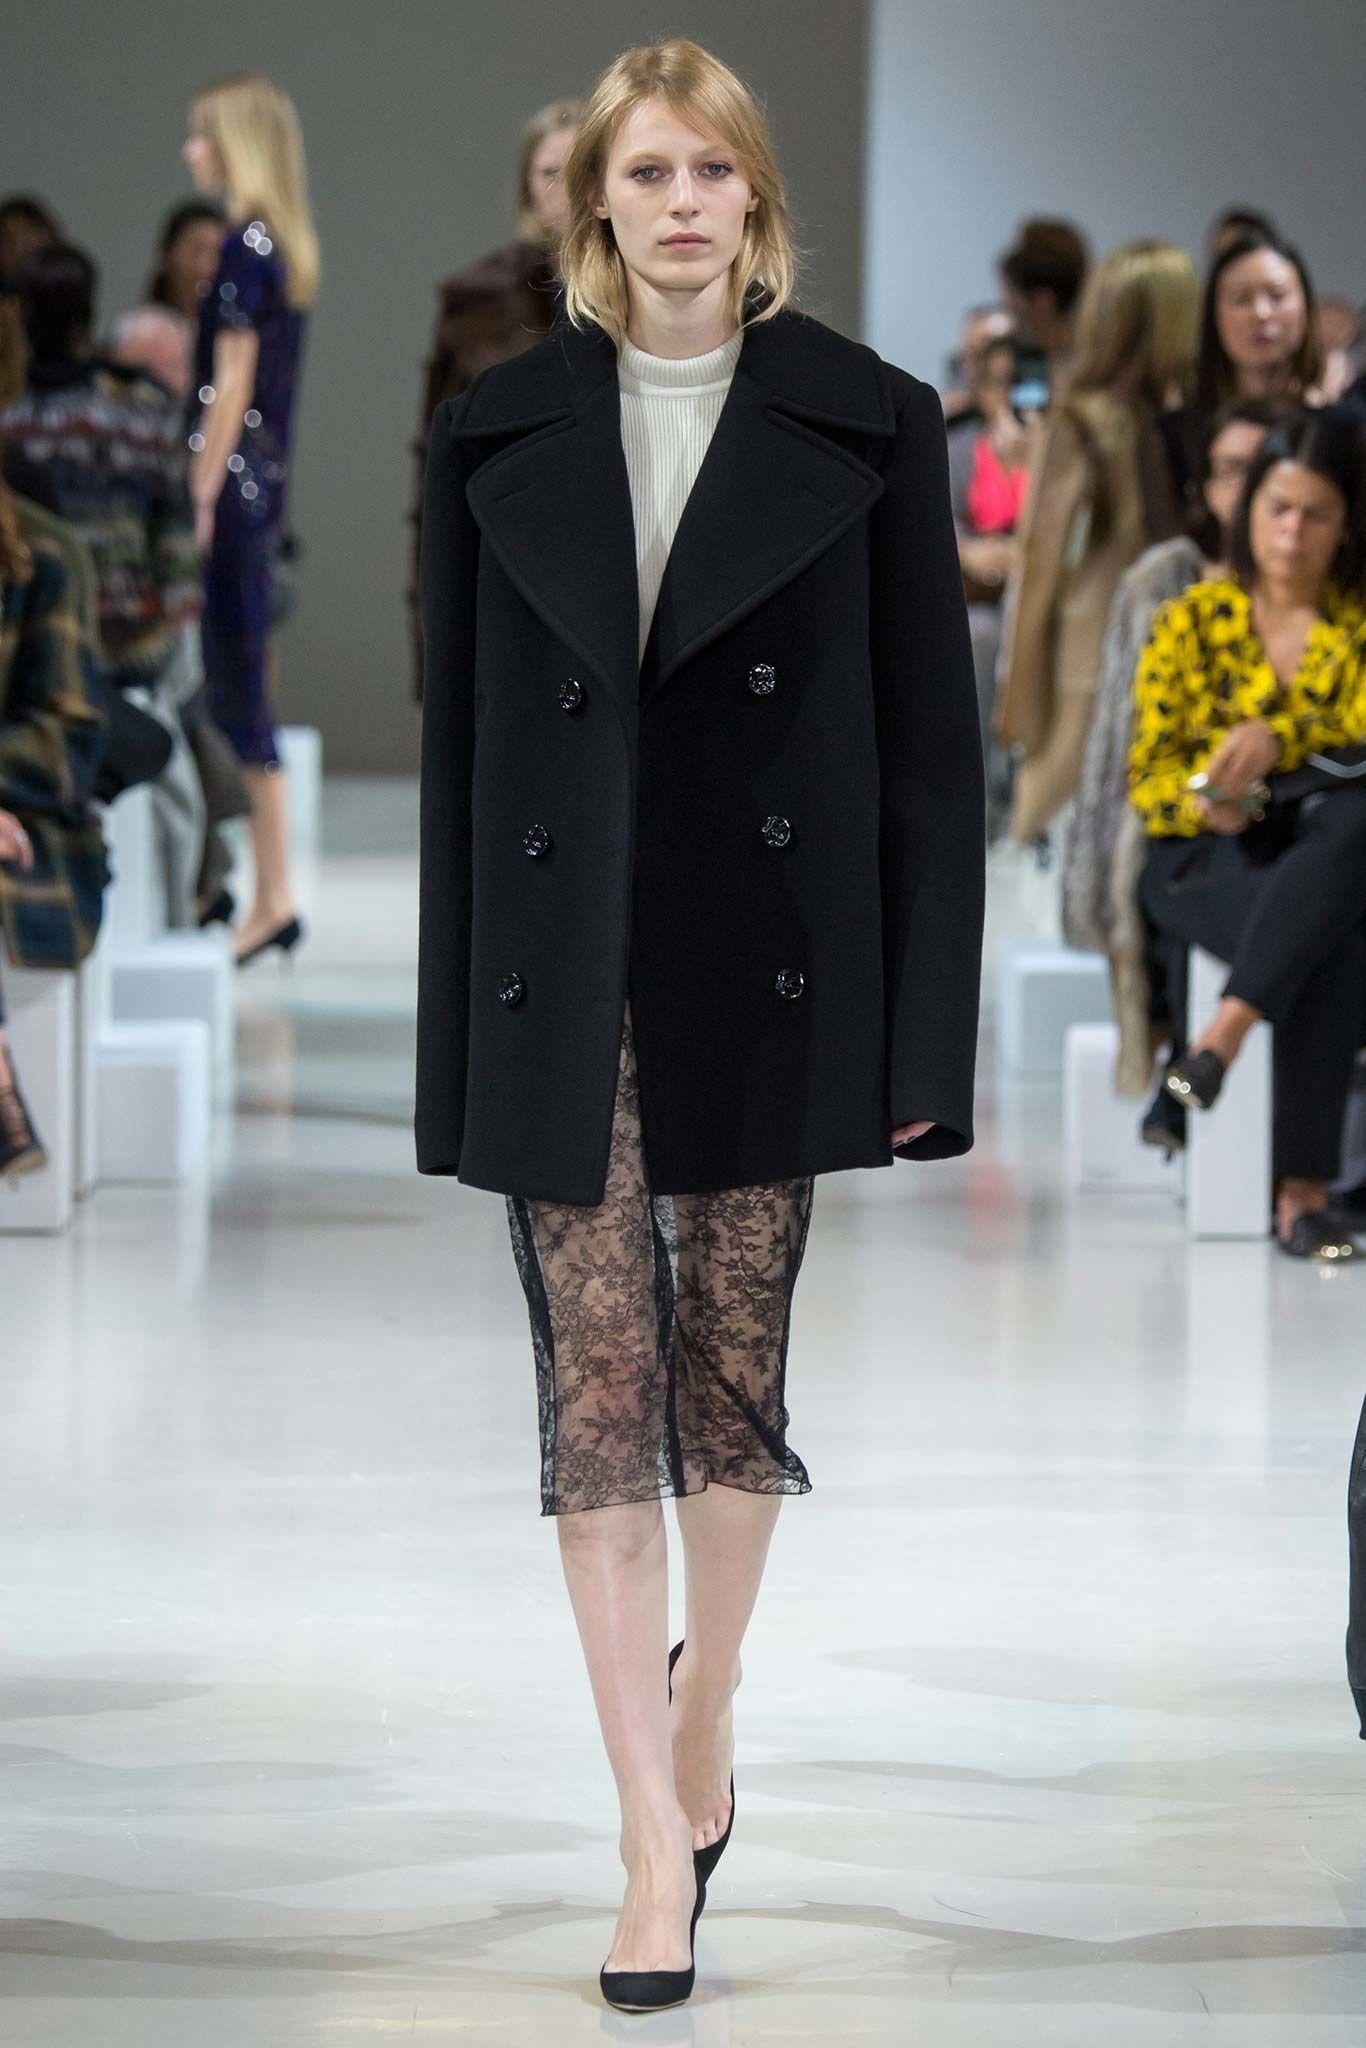 Nina Ricci Fall 2015 Ready-to-Wear Fashion Show - Julia Nobis (Viva)